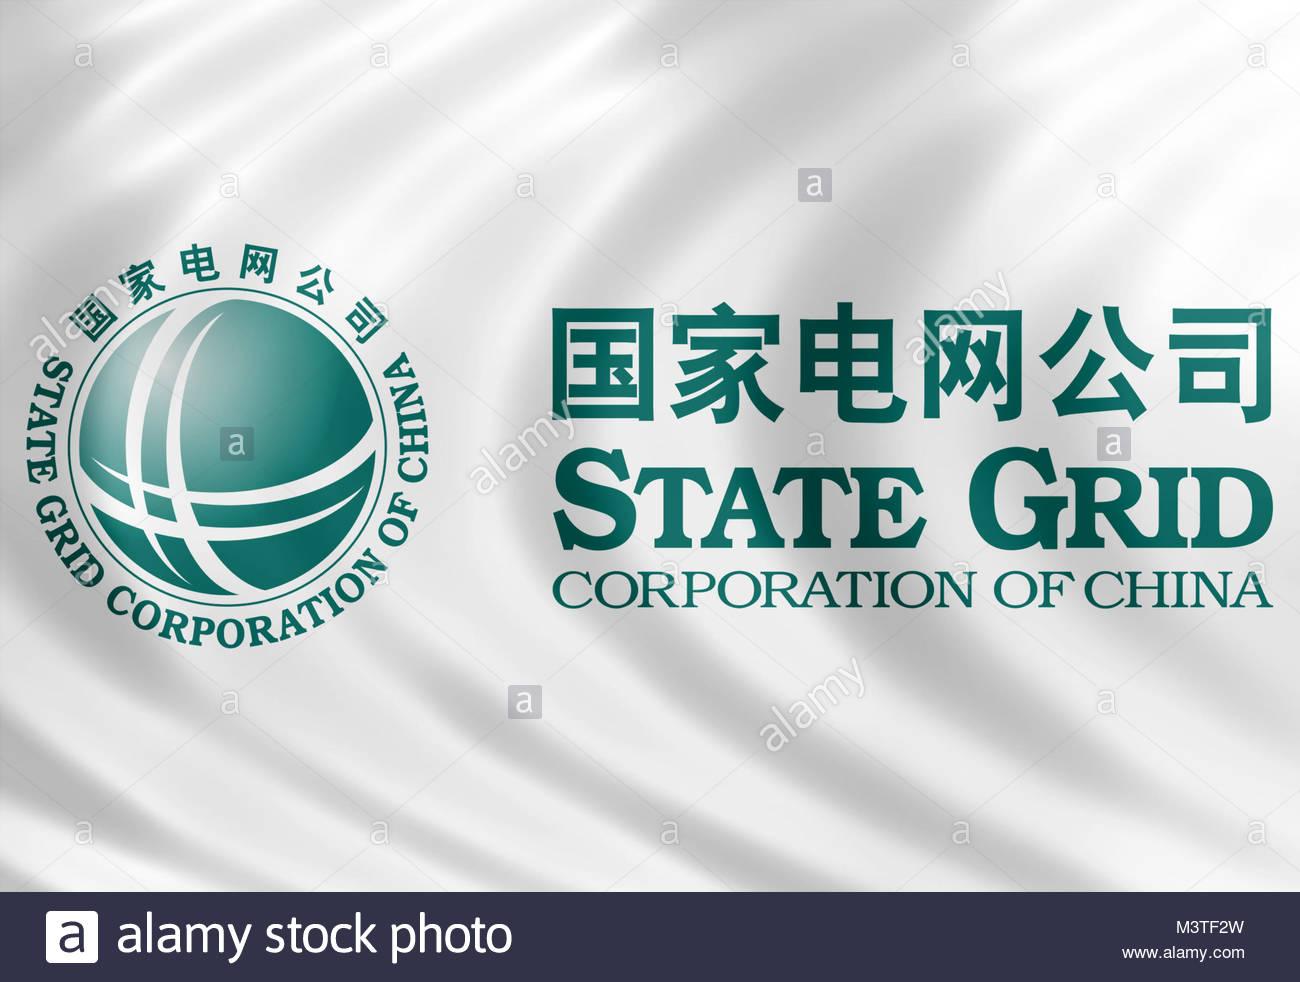 State Grid Corporation of China SGCC icon logo brand - Stock Image